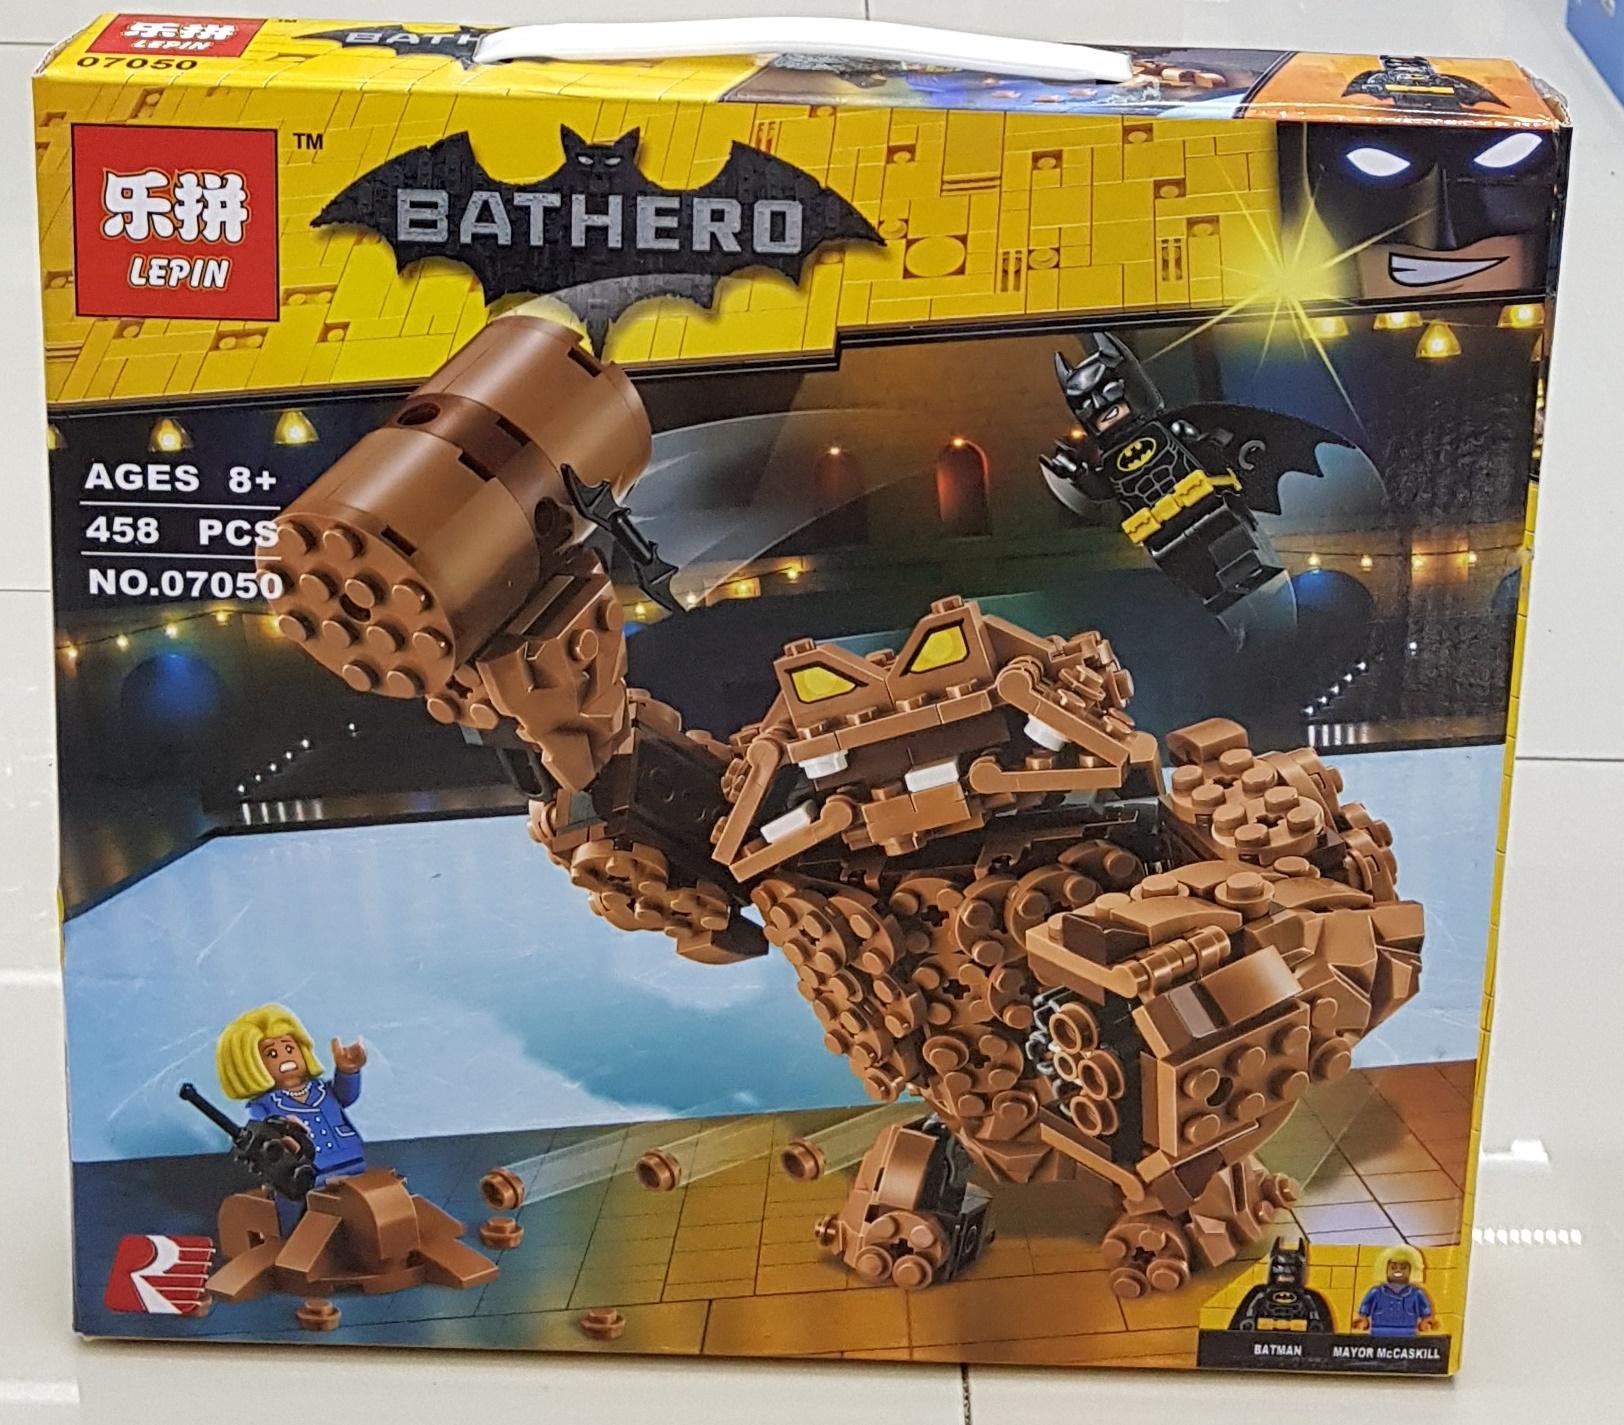 LEPIN BATHERO 07050 (458ชิ้น)